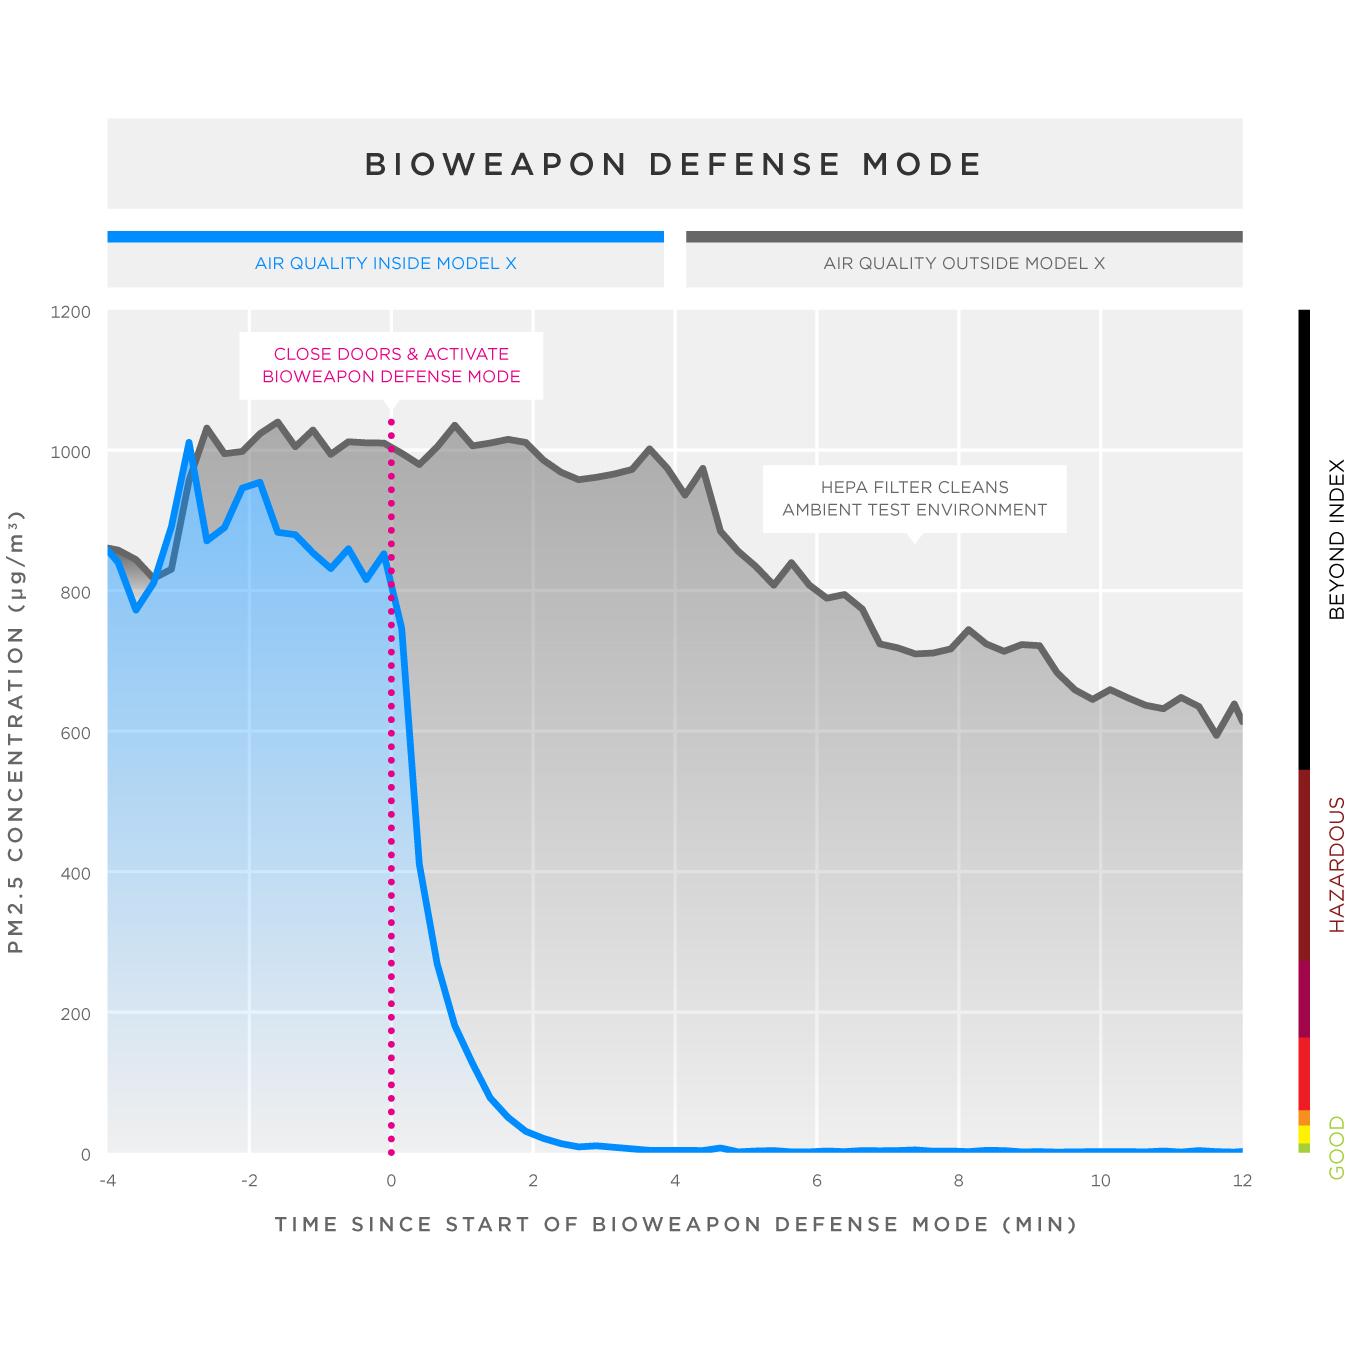 tesla-bioweapon-defense-mode-biohazard